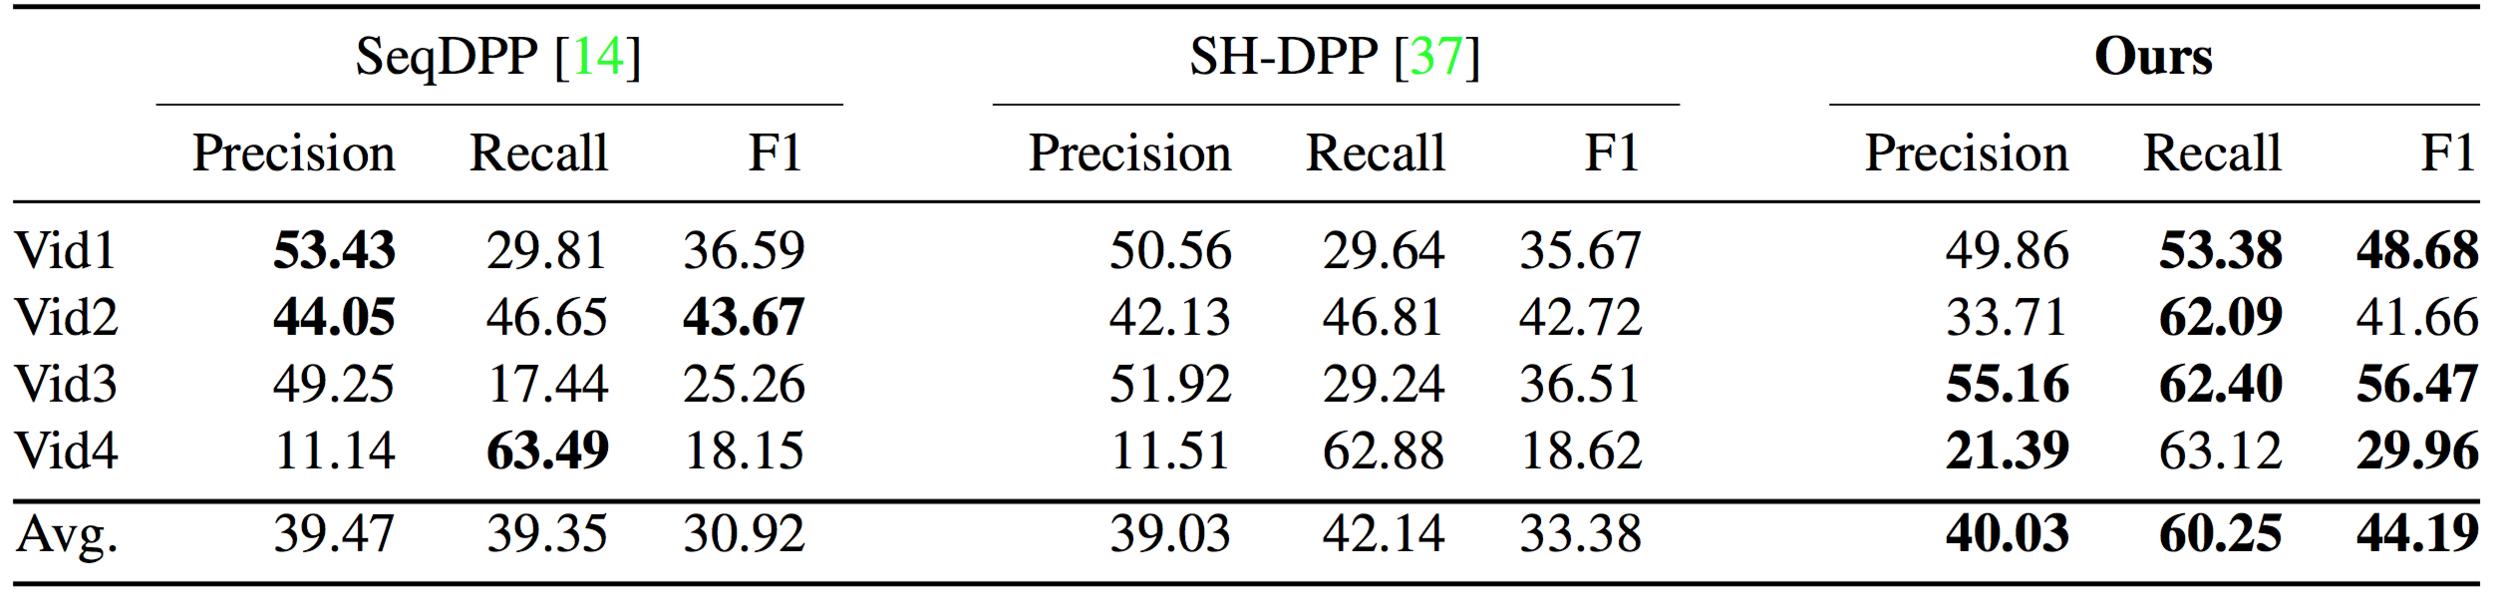 Comparison results for query-focused video summarization